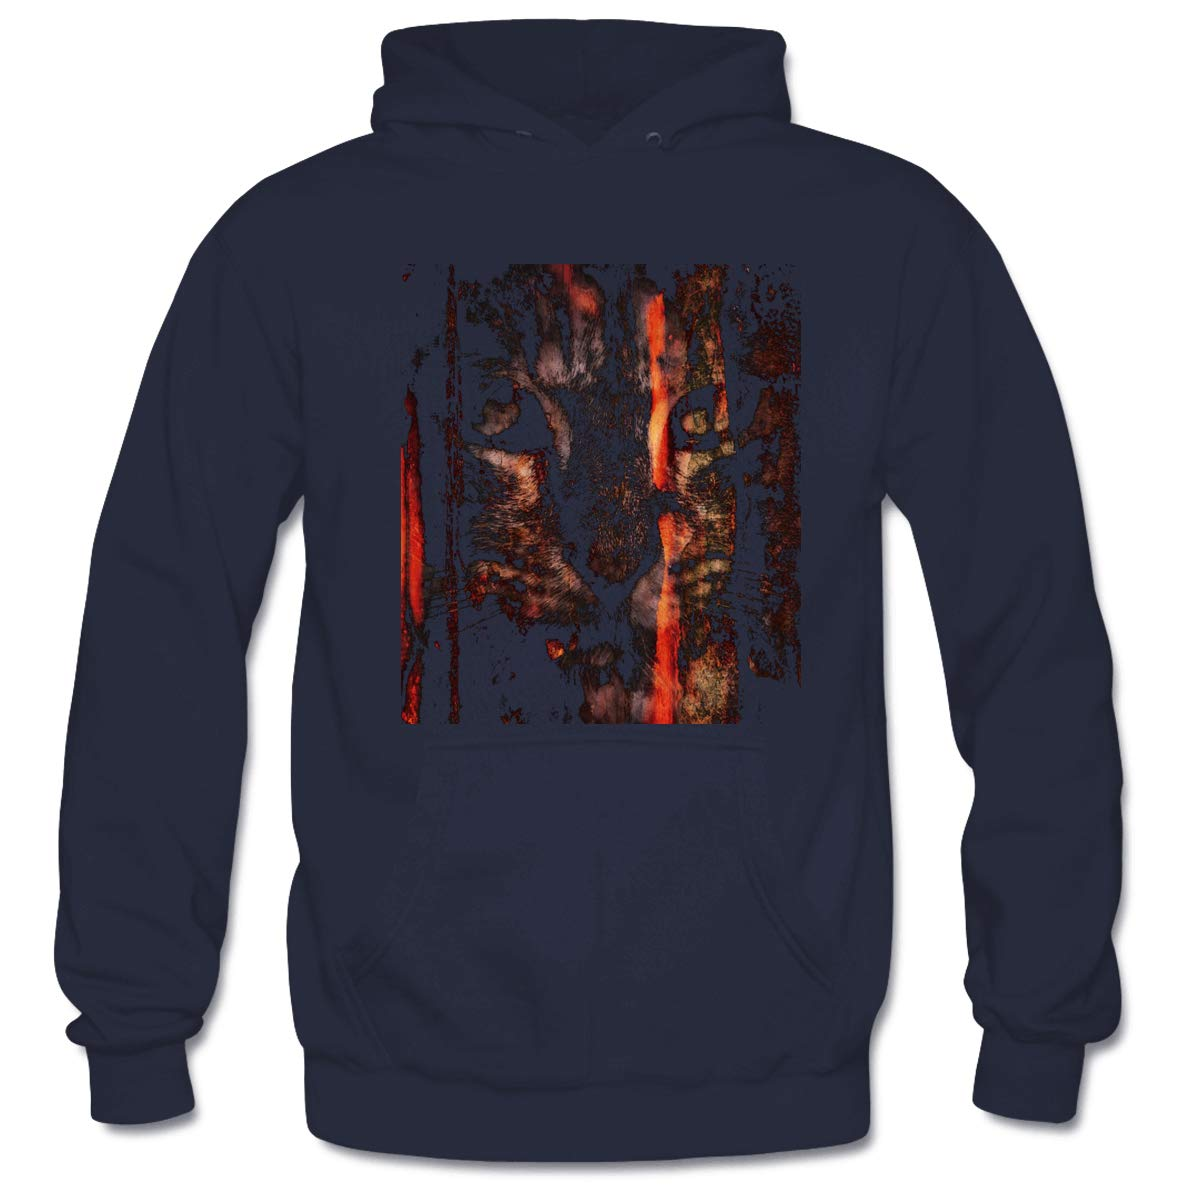 Mens Dark Cat Grunge Hooded Sweatshirt Funny Printed Pullover Hoodies Classic Long Sleeve T Shirt Tops